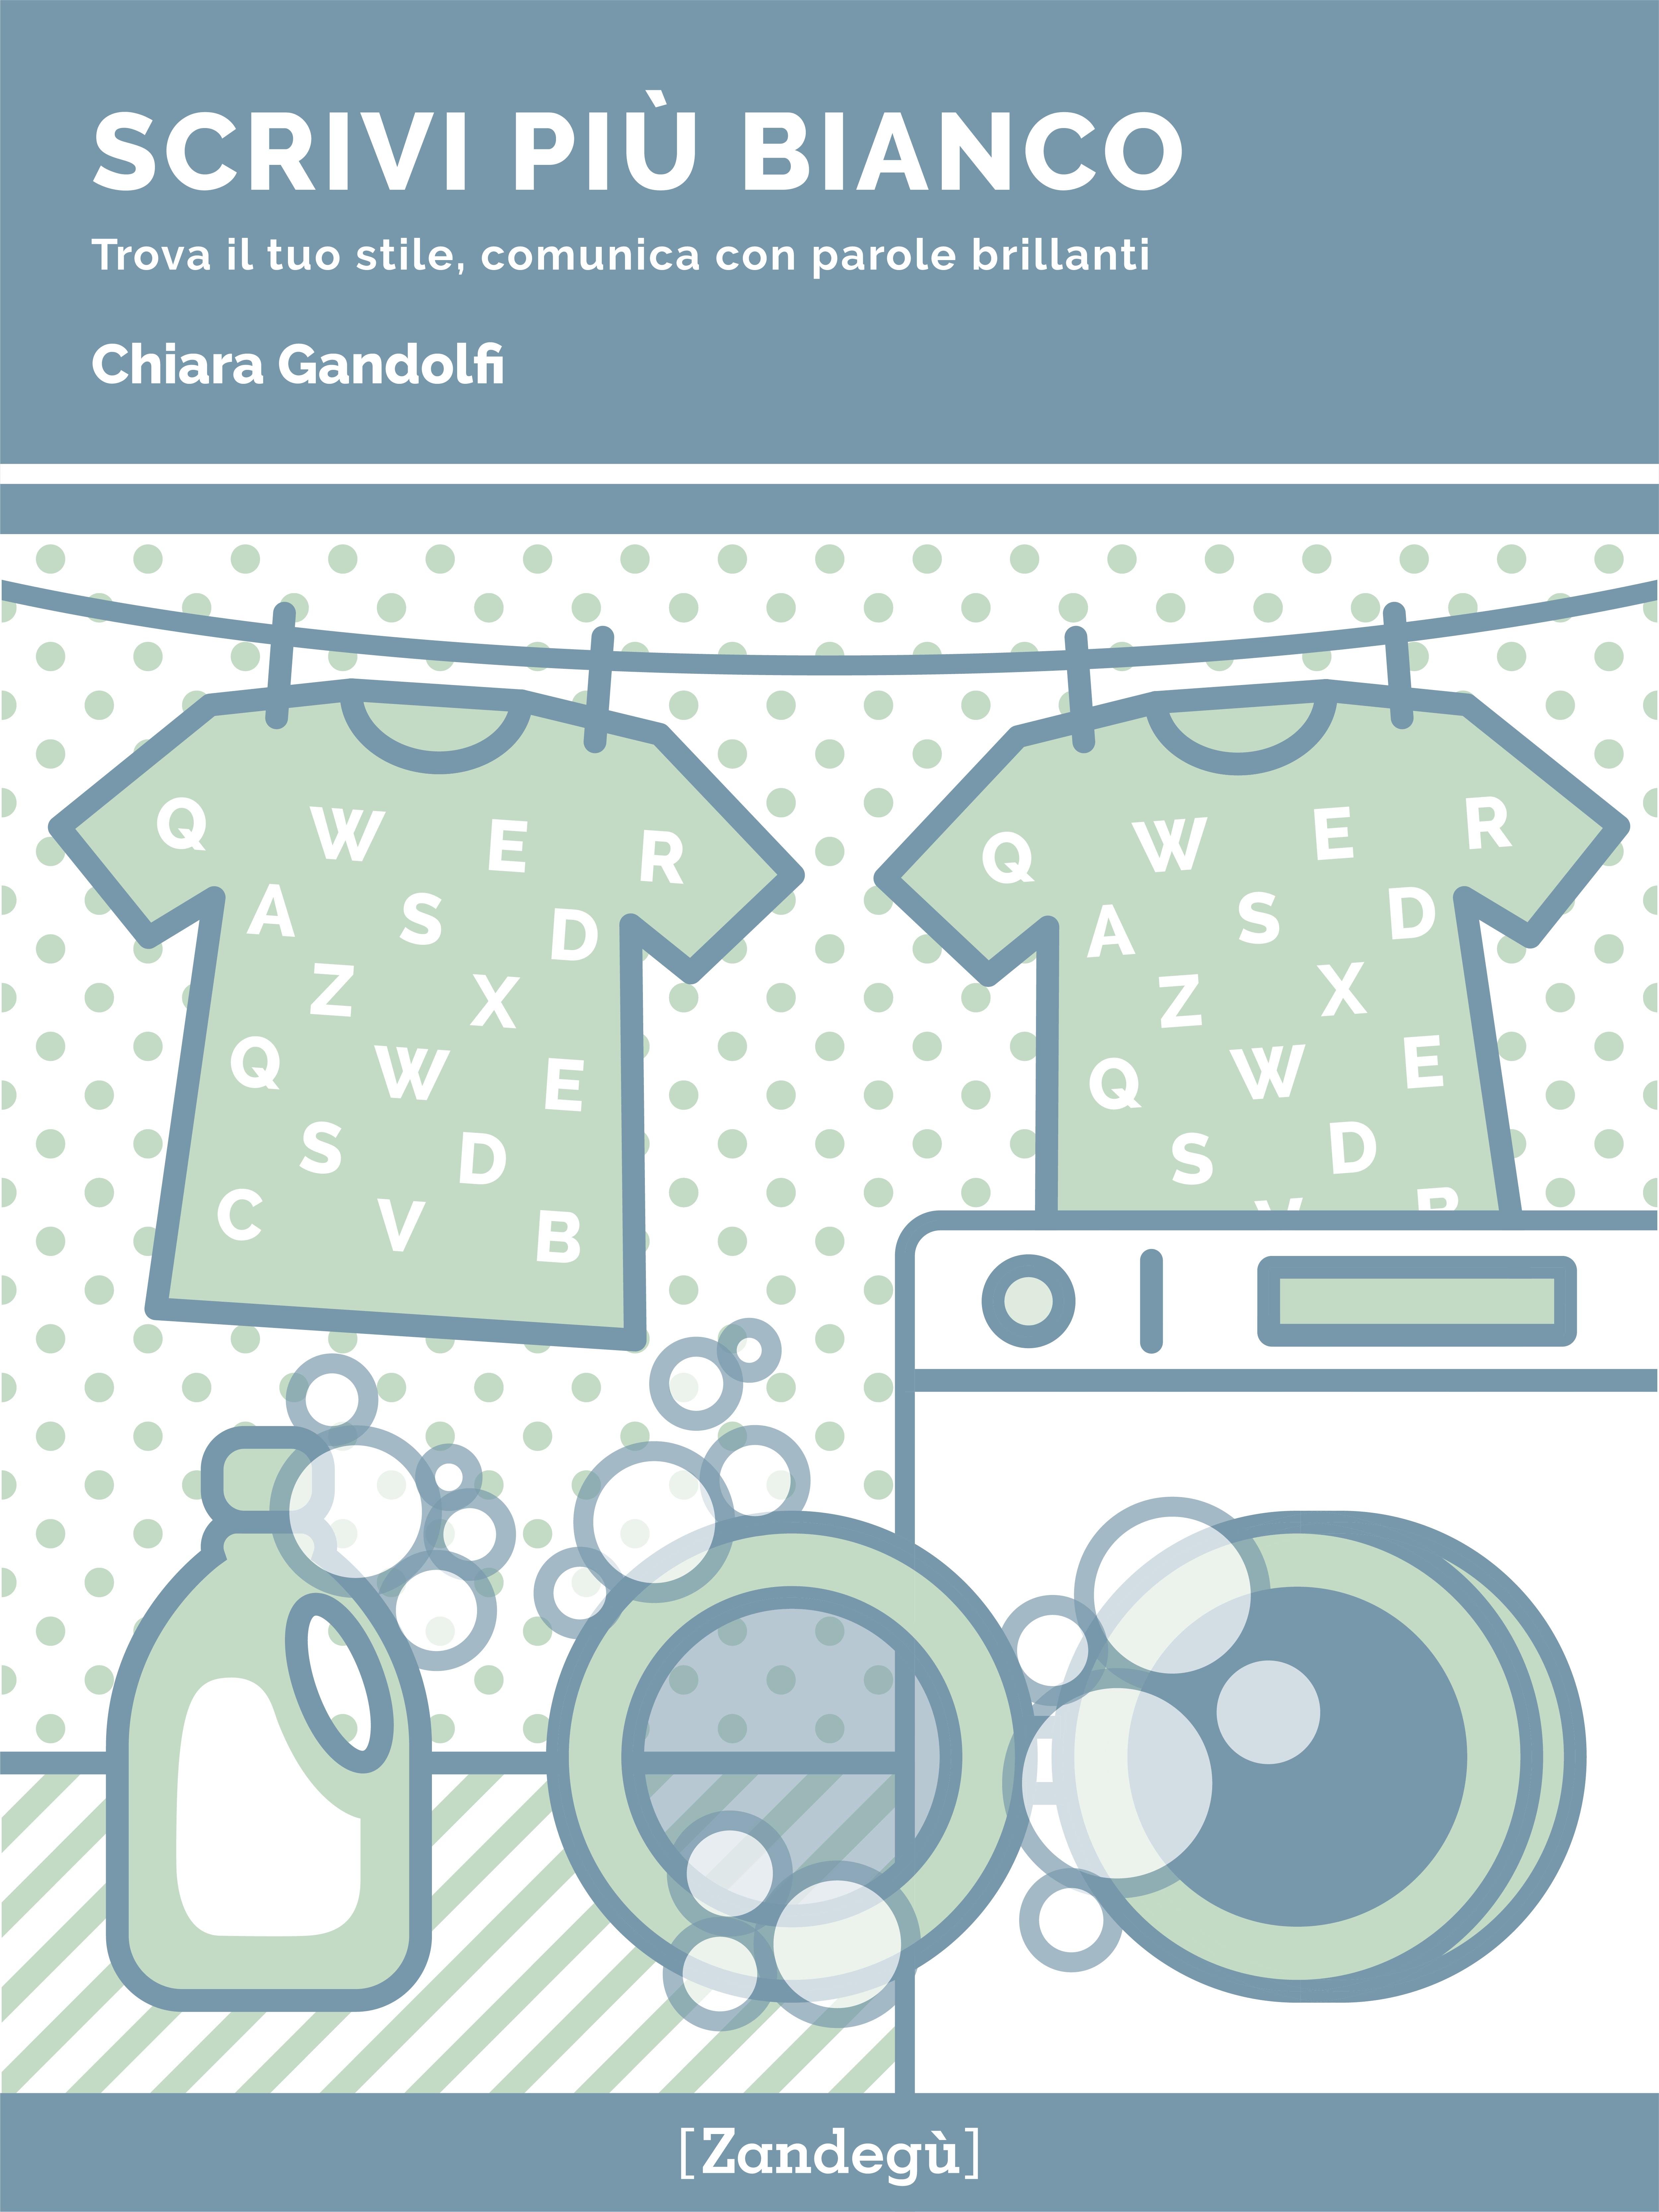 libro | ebook | scrivi più bianco | chiara gandolfi | balenalab